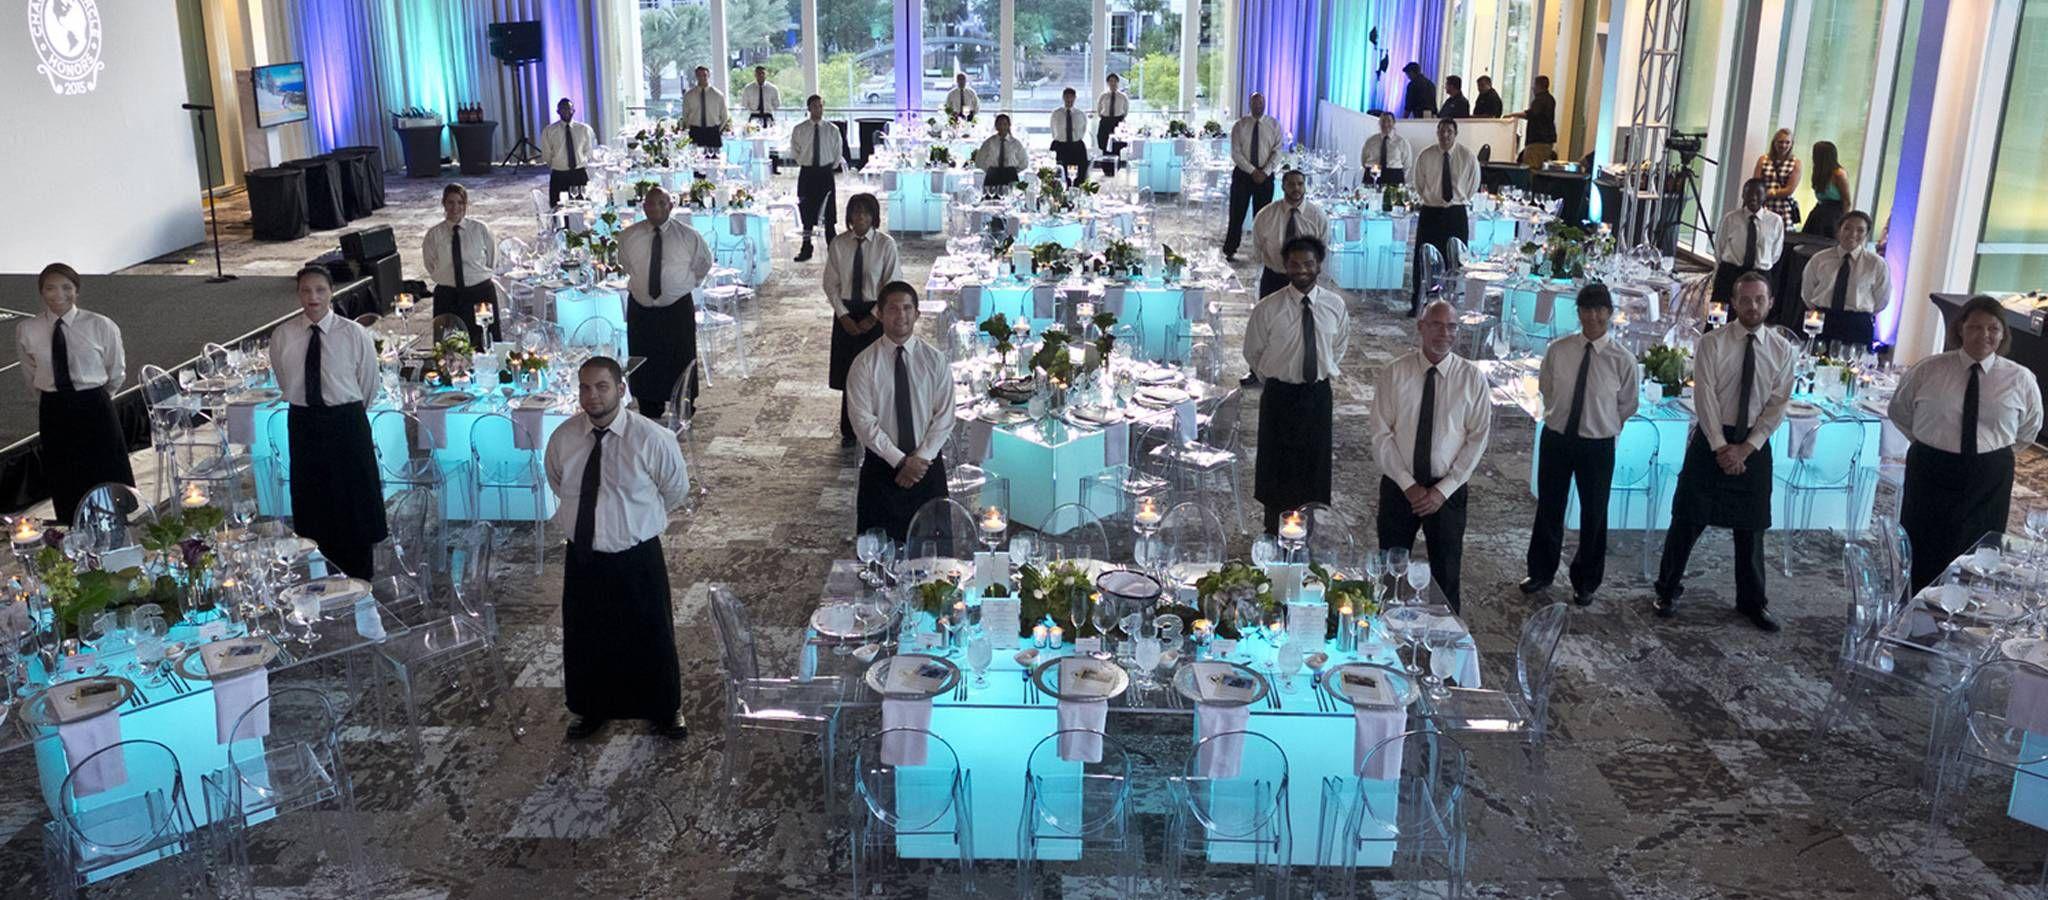 Association dinner royal table orlando events cocktail